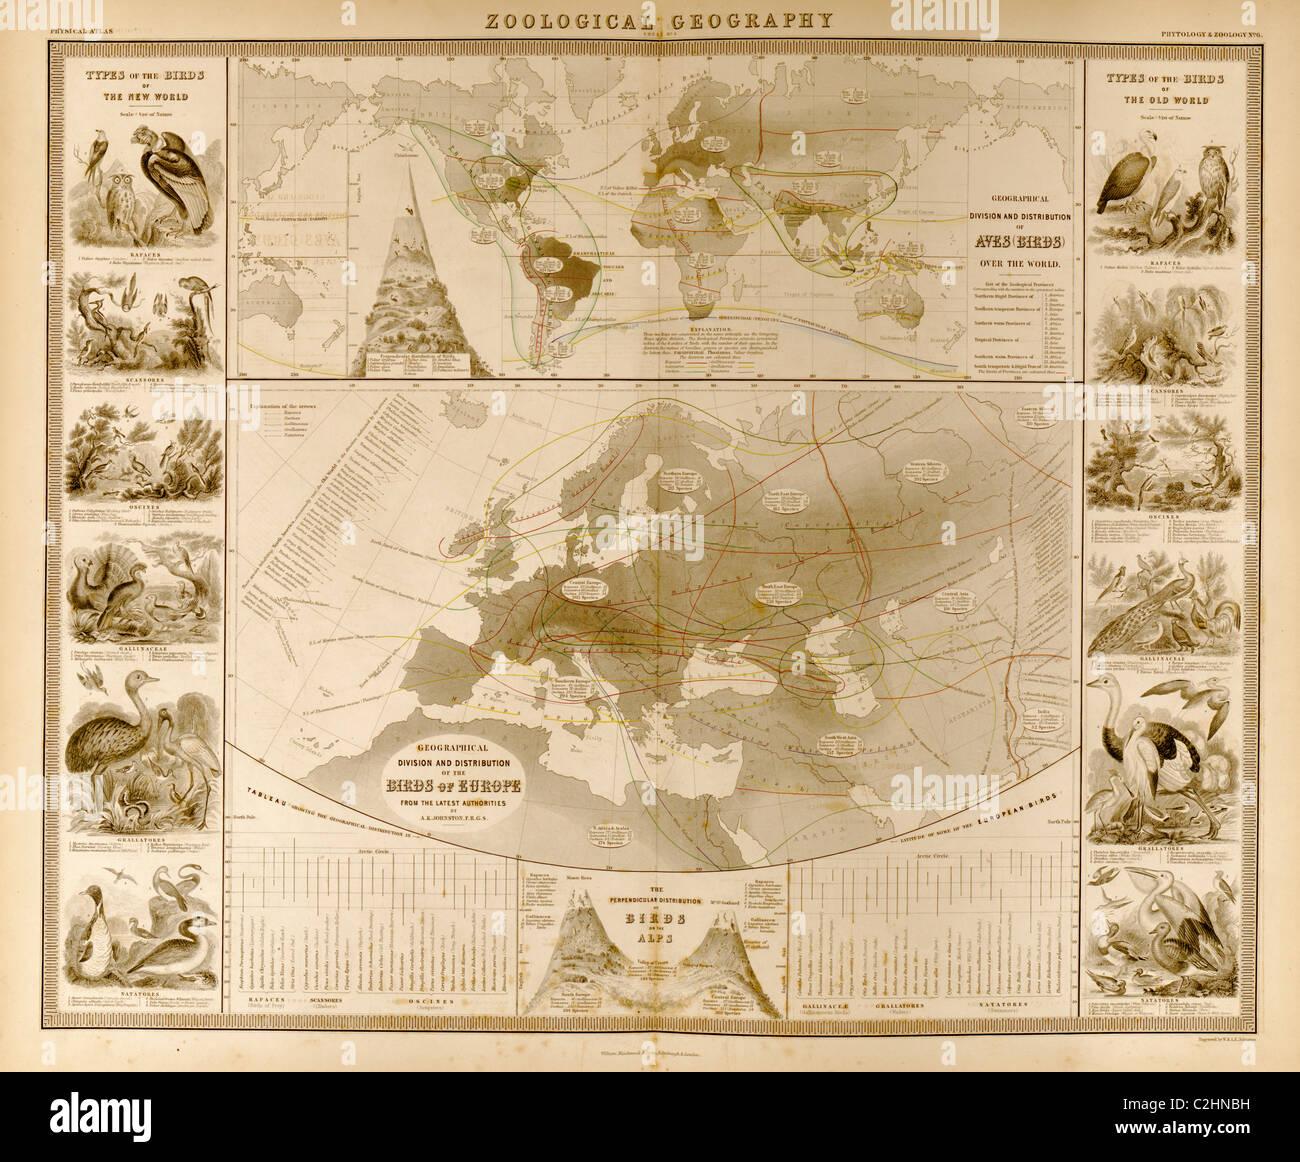 Zoologische Geographie; Birds of the World Stockbild